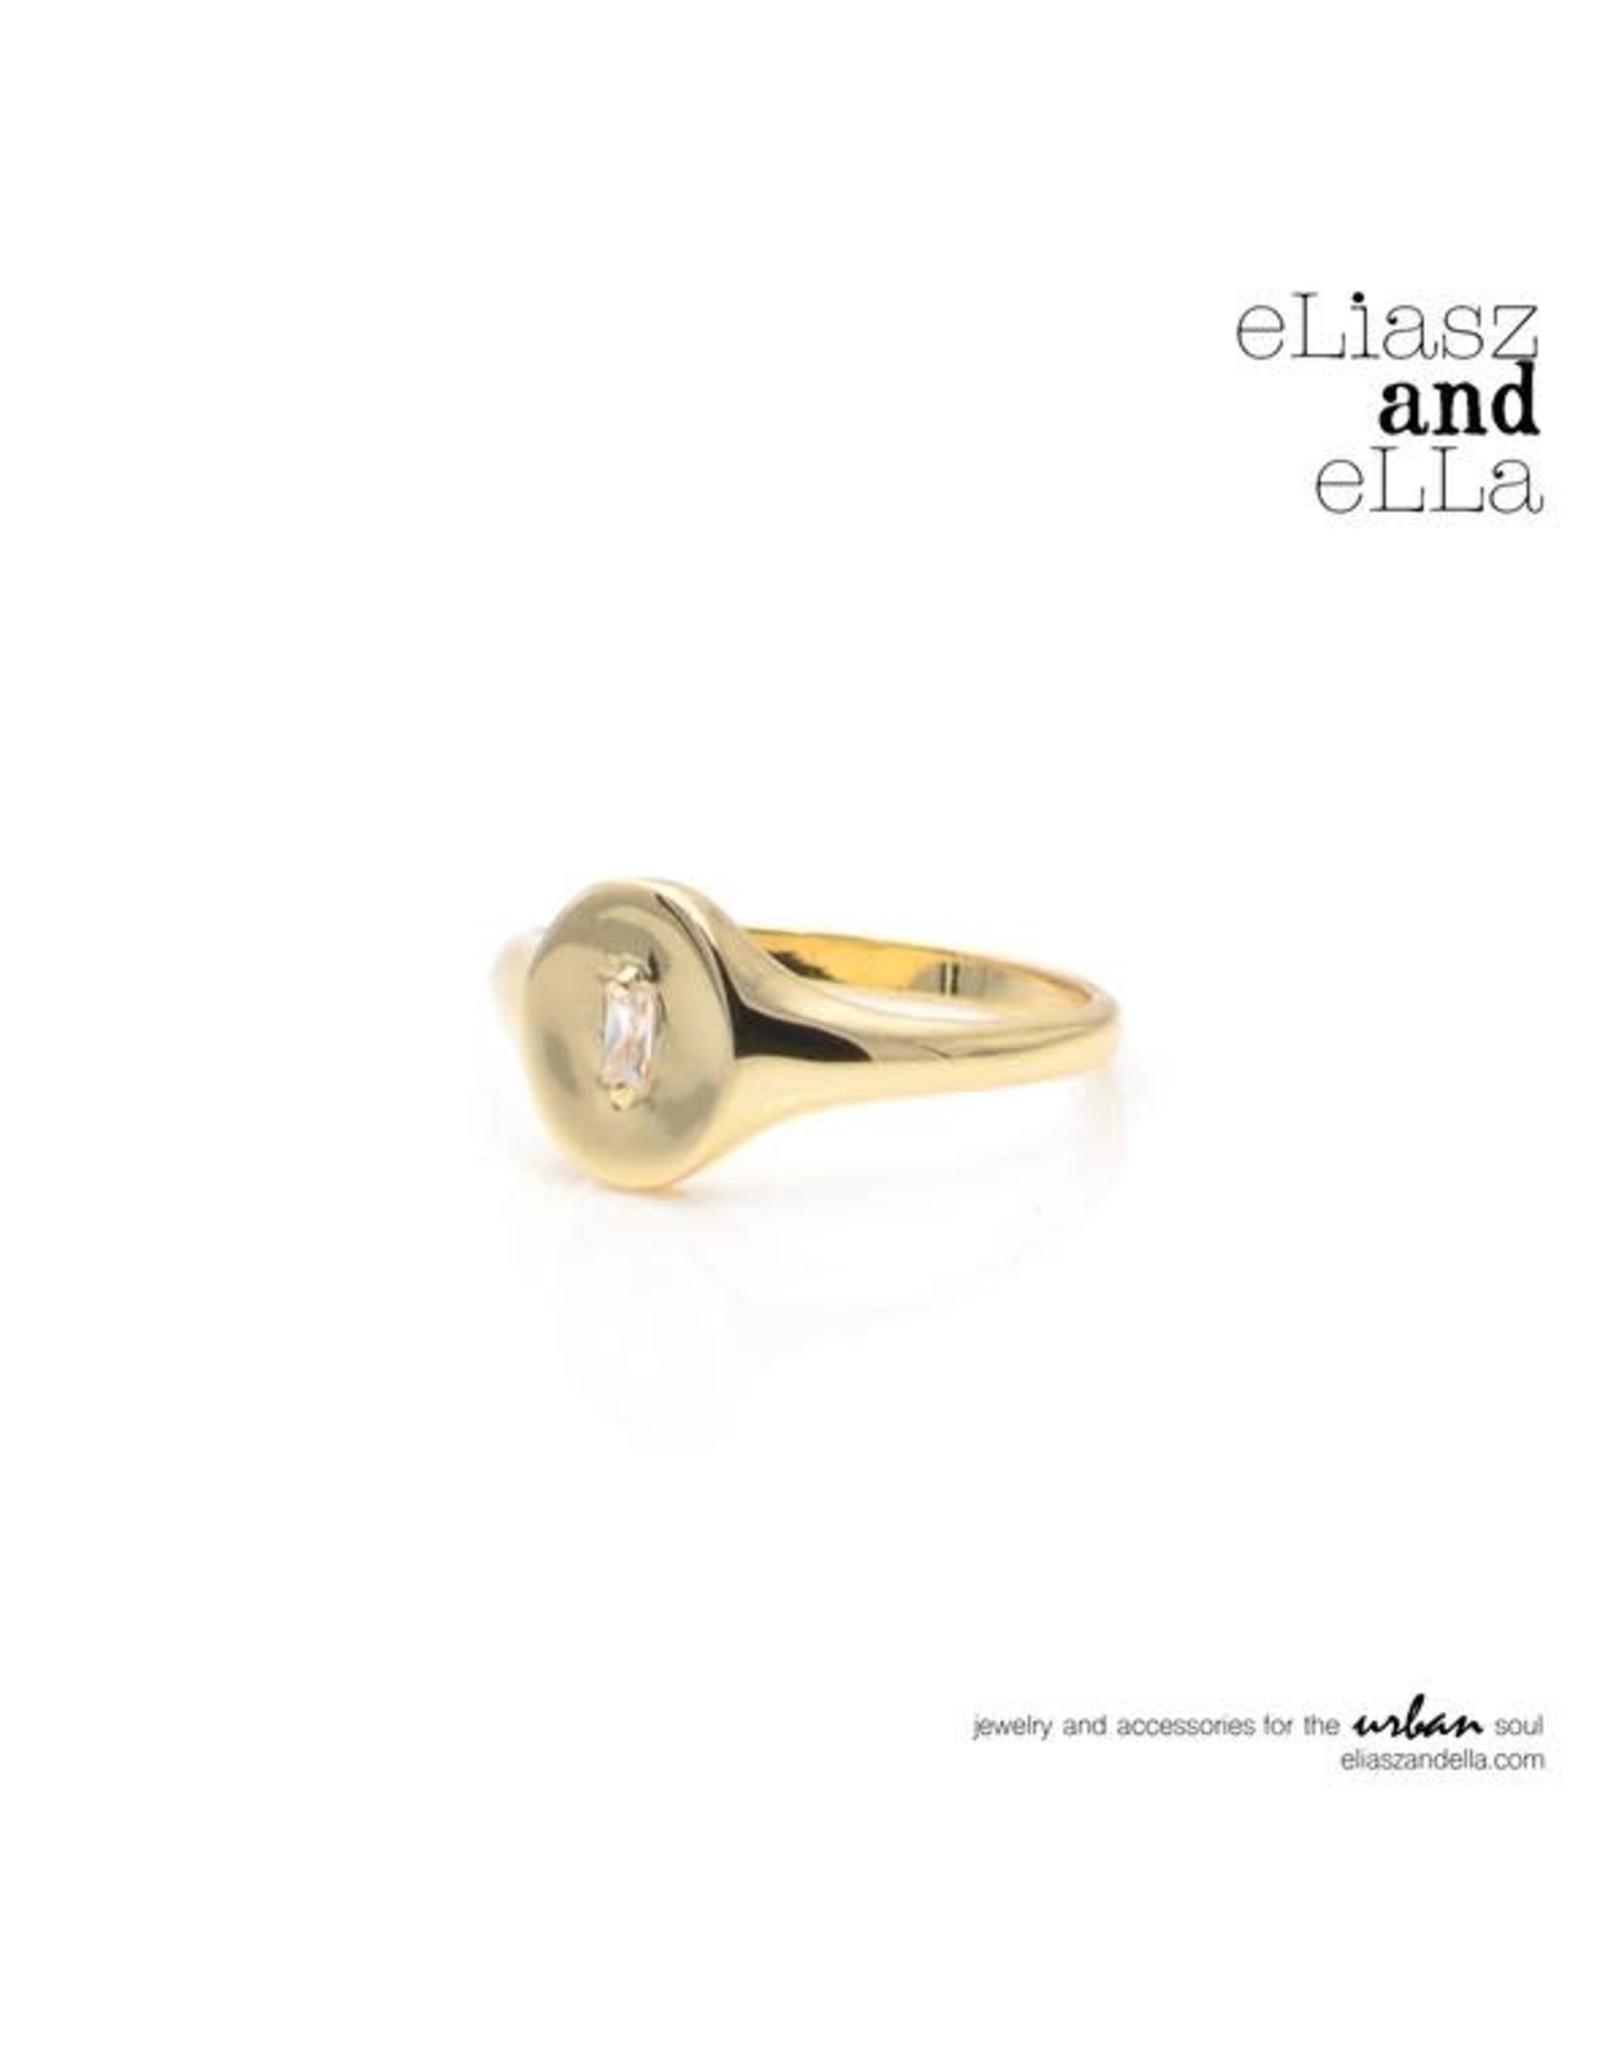 "eLiasz and eLLa ""Signet"" Ring"